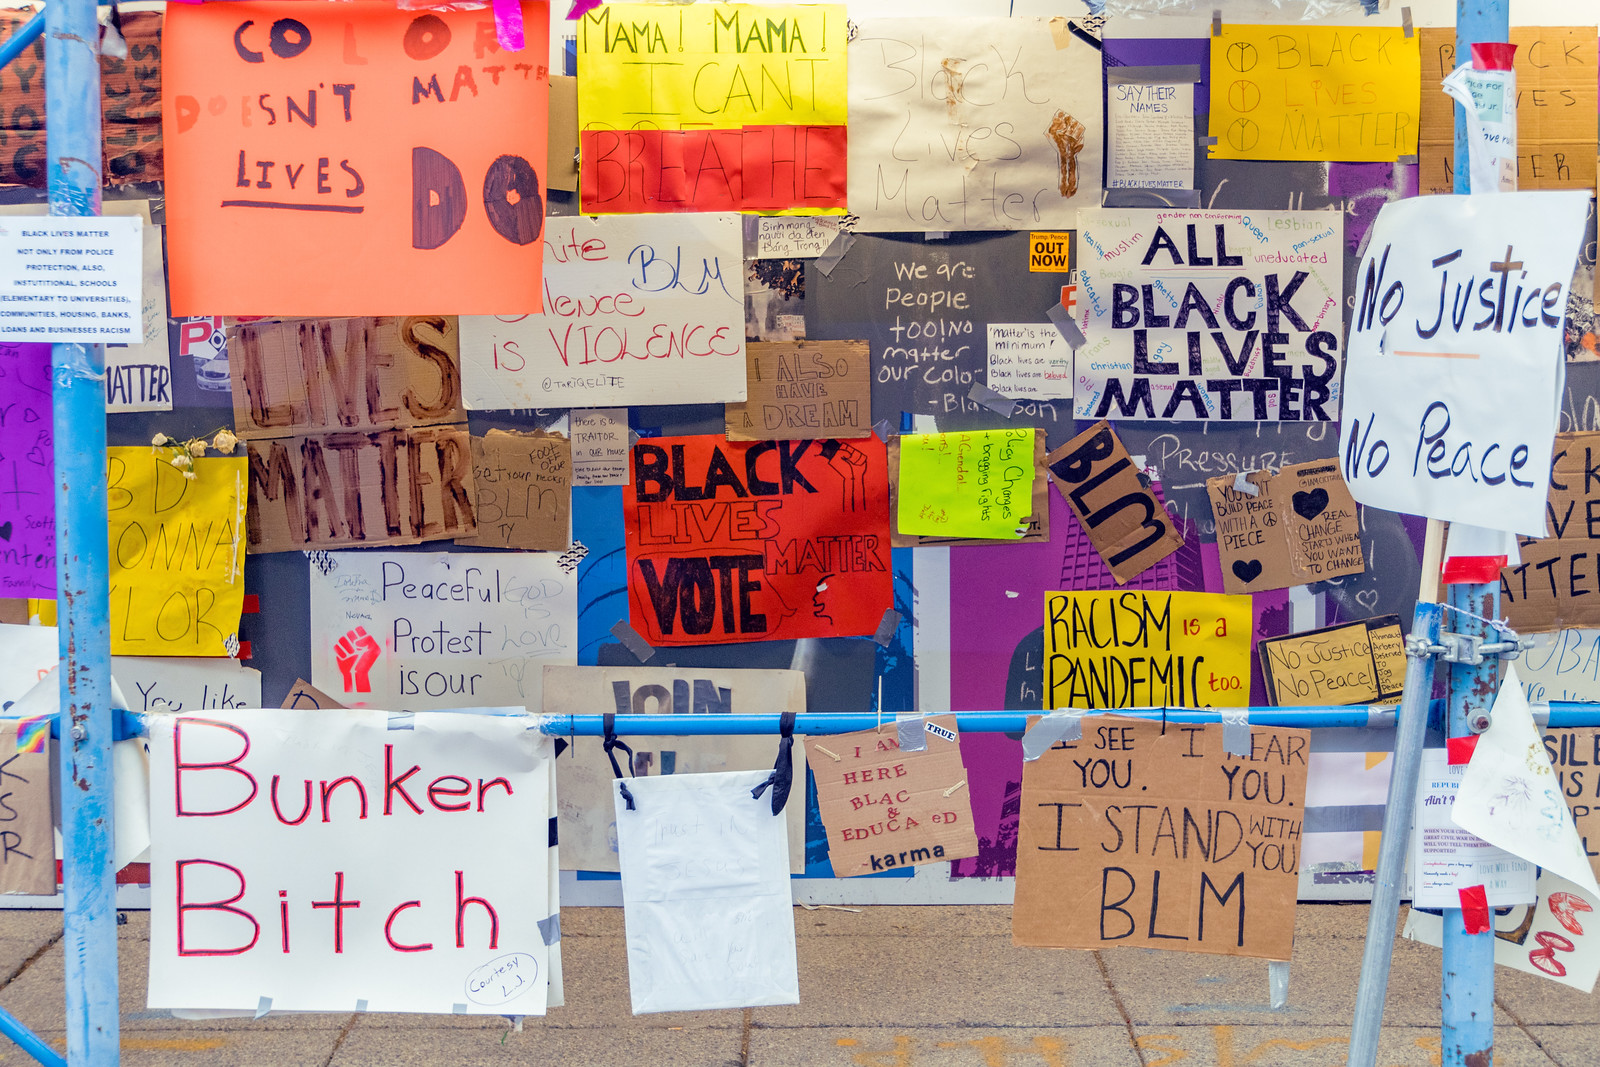 2020.06.19 Black Lives Matter Plaza, Washington, DC USA 171 41233